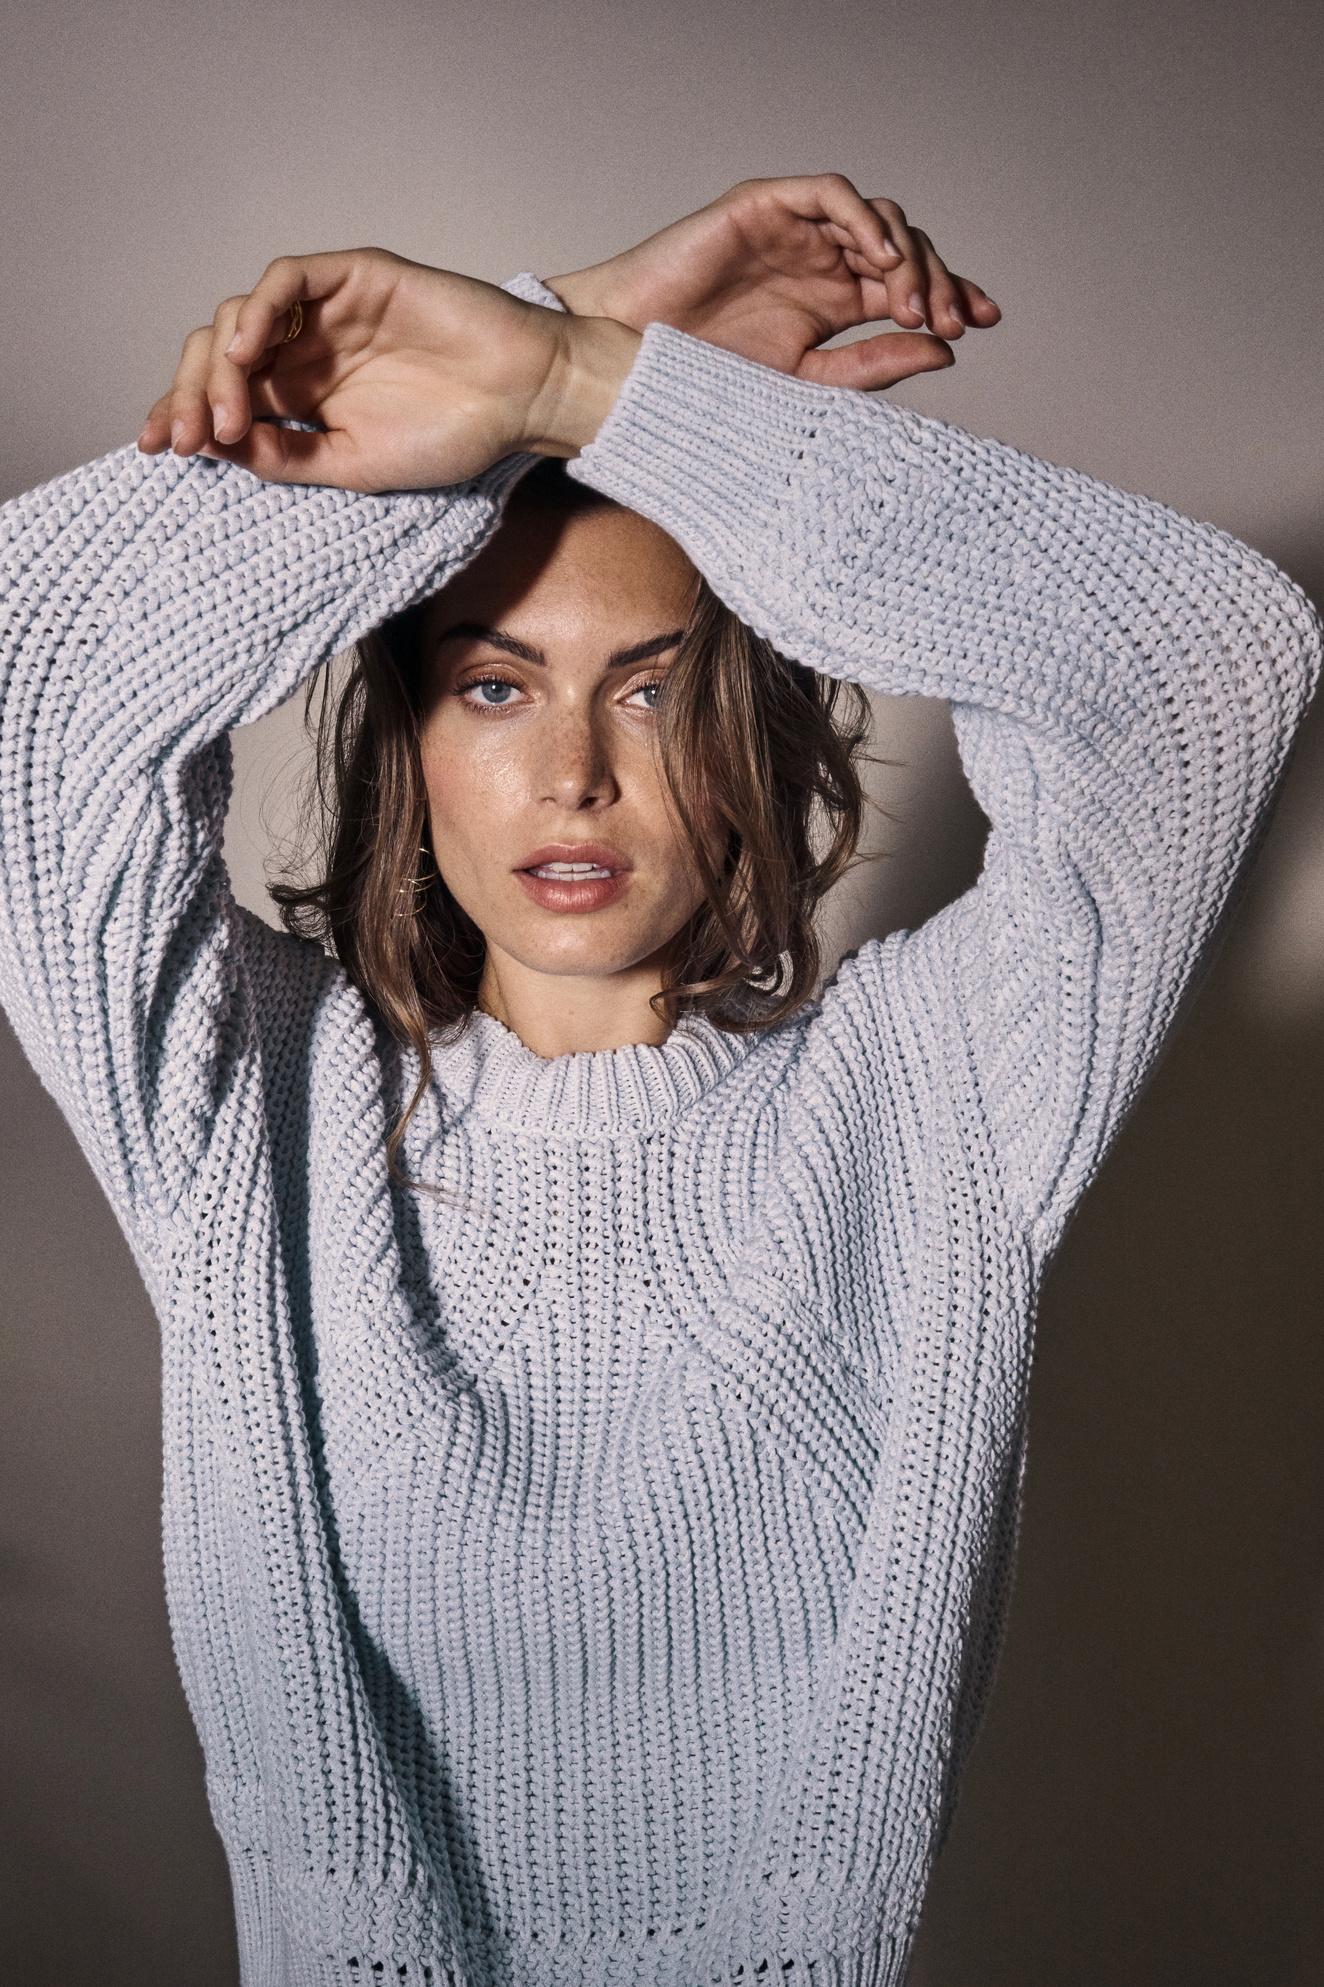 Lizza Knit - Celestial Blue M-2